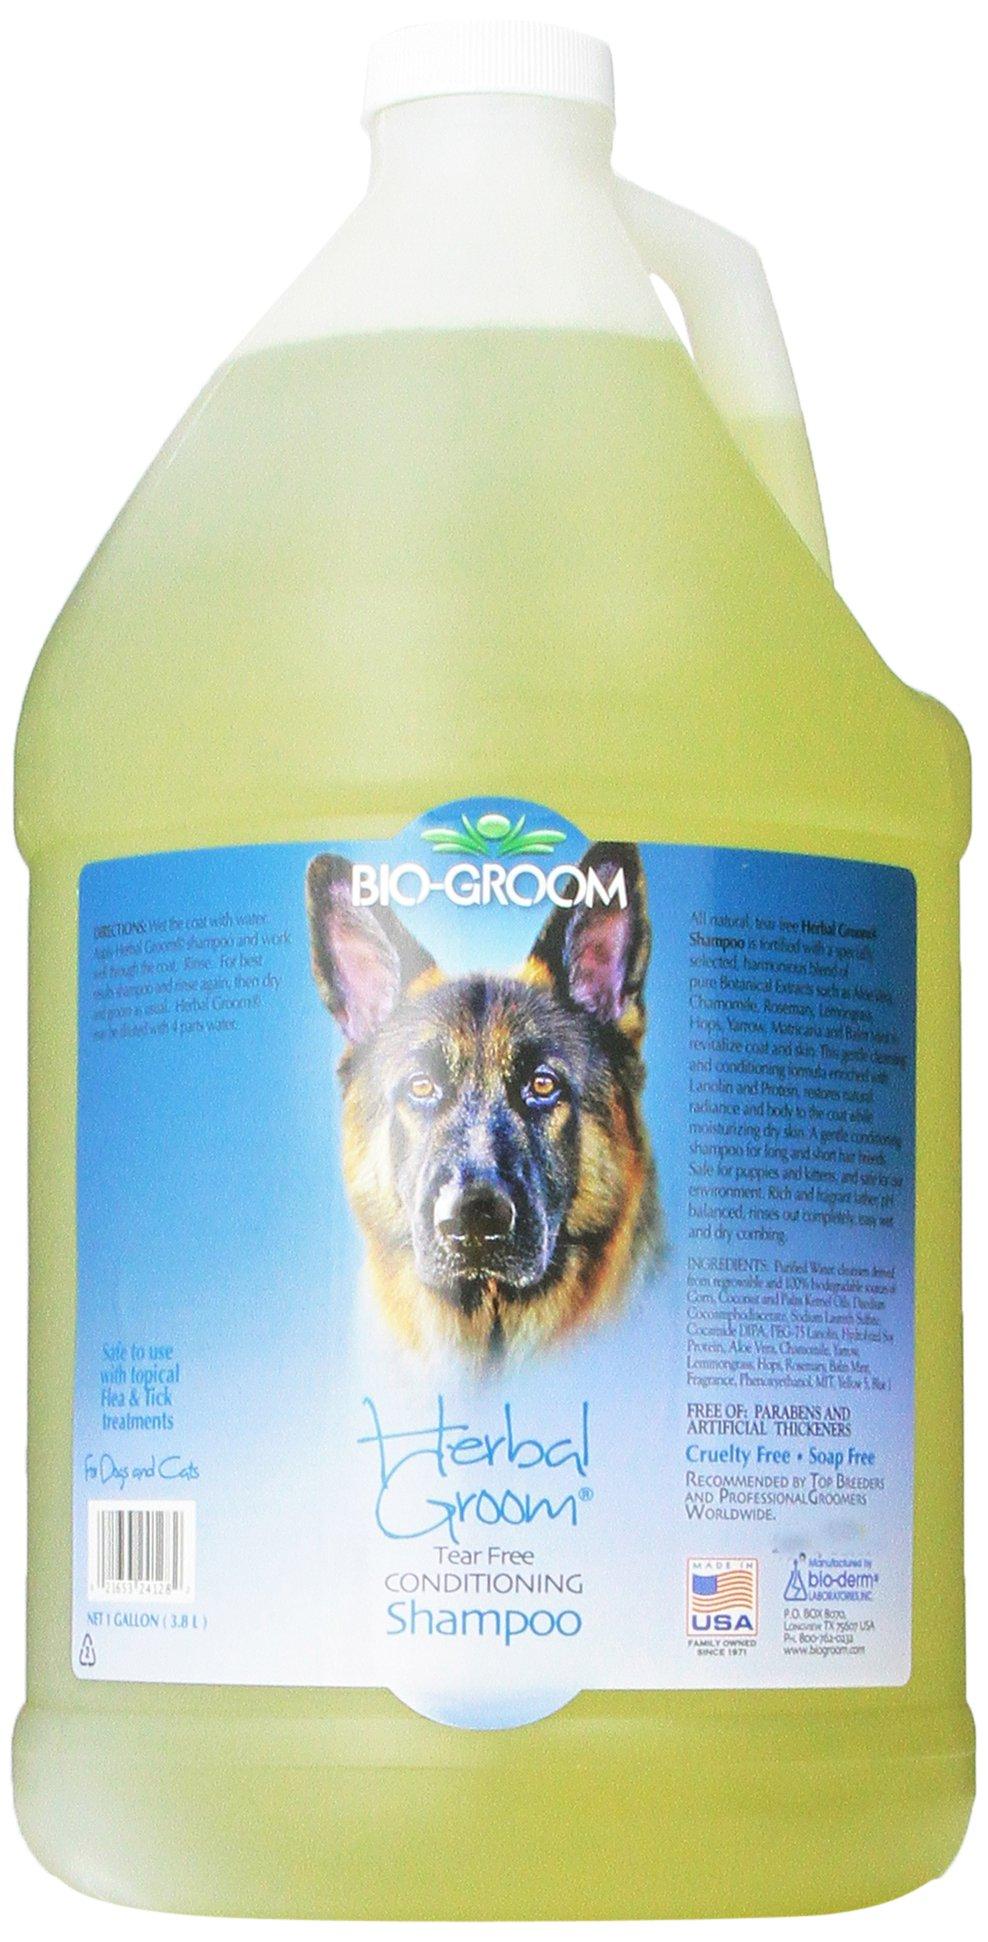 Bio-Groom Herbal Groom Puppies and Kittens Conditioning Shampoo, 1-Gallon